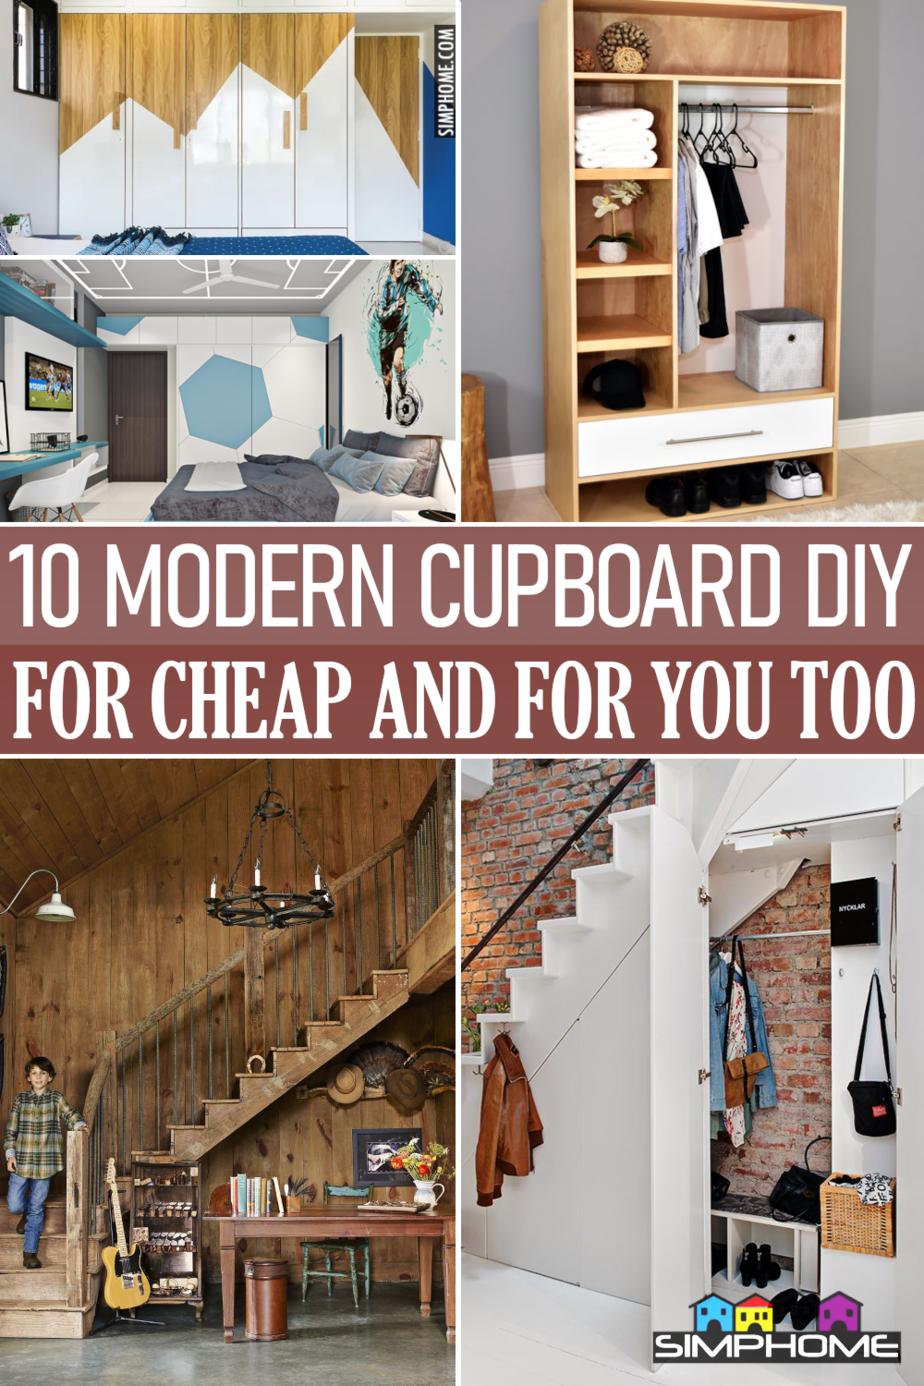 10 Modern Cupboard Design for Cheap via Simphome.com Featured